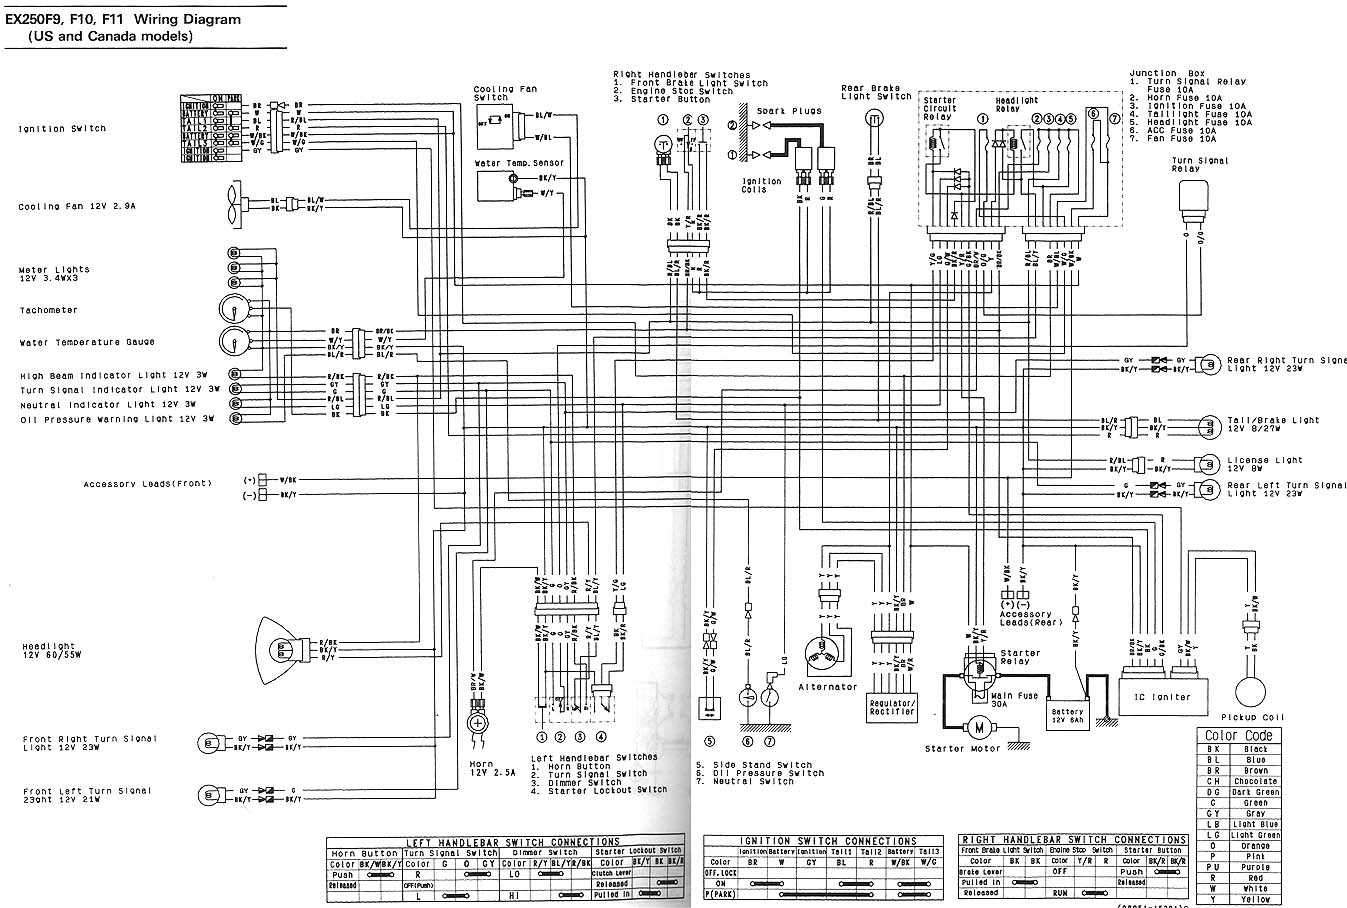 2006 Ninja 250 Wiring Diagram - Wiring Diagram Dash on evinrude tachometer wiring diagram, evinrude ignition wiring diagram, evinrude power trim wiring diagram, 1992 evinrude wiring diagram, evinrude 150 wiring diagram, johnson evinrude wiring diagram, mercury outboard wiring diagram, 1996 evinrude wiring diagram, 40 hp evinrude wiring diagram, 1988 evinrude wiring diagram, 1989 evinrude carburetor, 1989 evinrude neutral safety switch, marine ignition switch wiring diagram, evinrude outboard motor wiring diagram, 1999 evinrude wiring diagram,